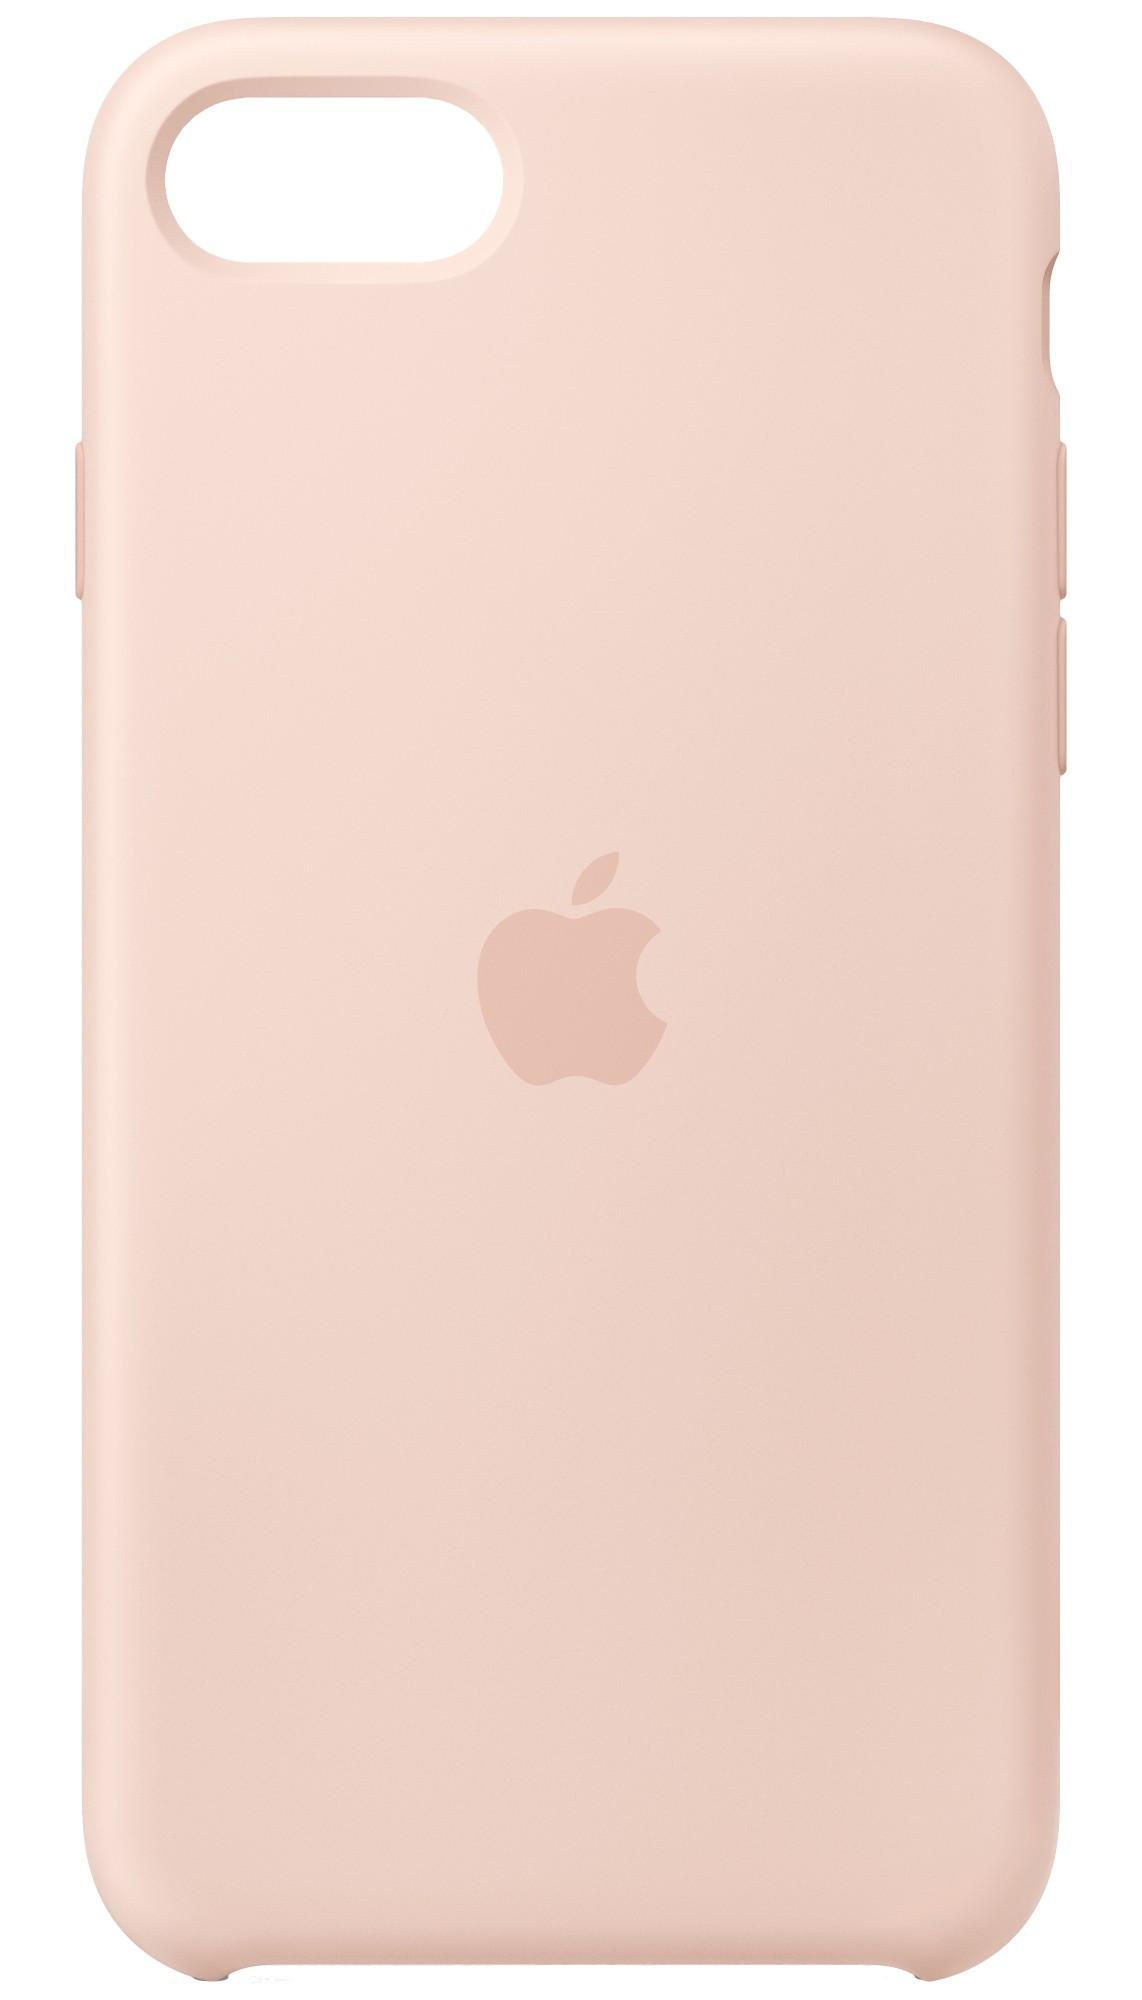 "Apple MXYK2ZM/A?ES funda para teléfono móvil 11,9 cm (4.7"") Rosa, Arena"